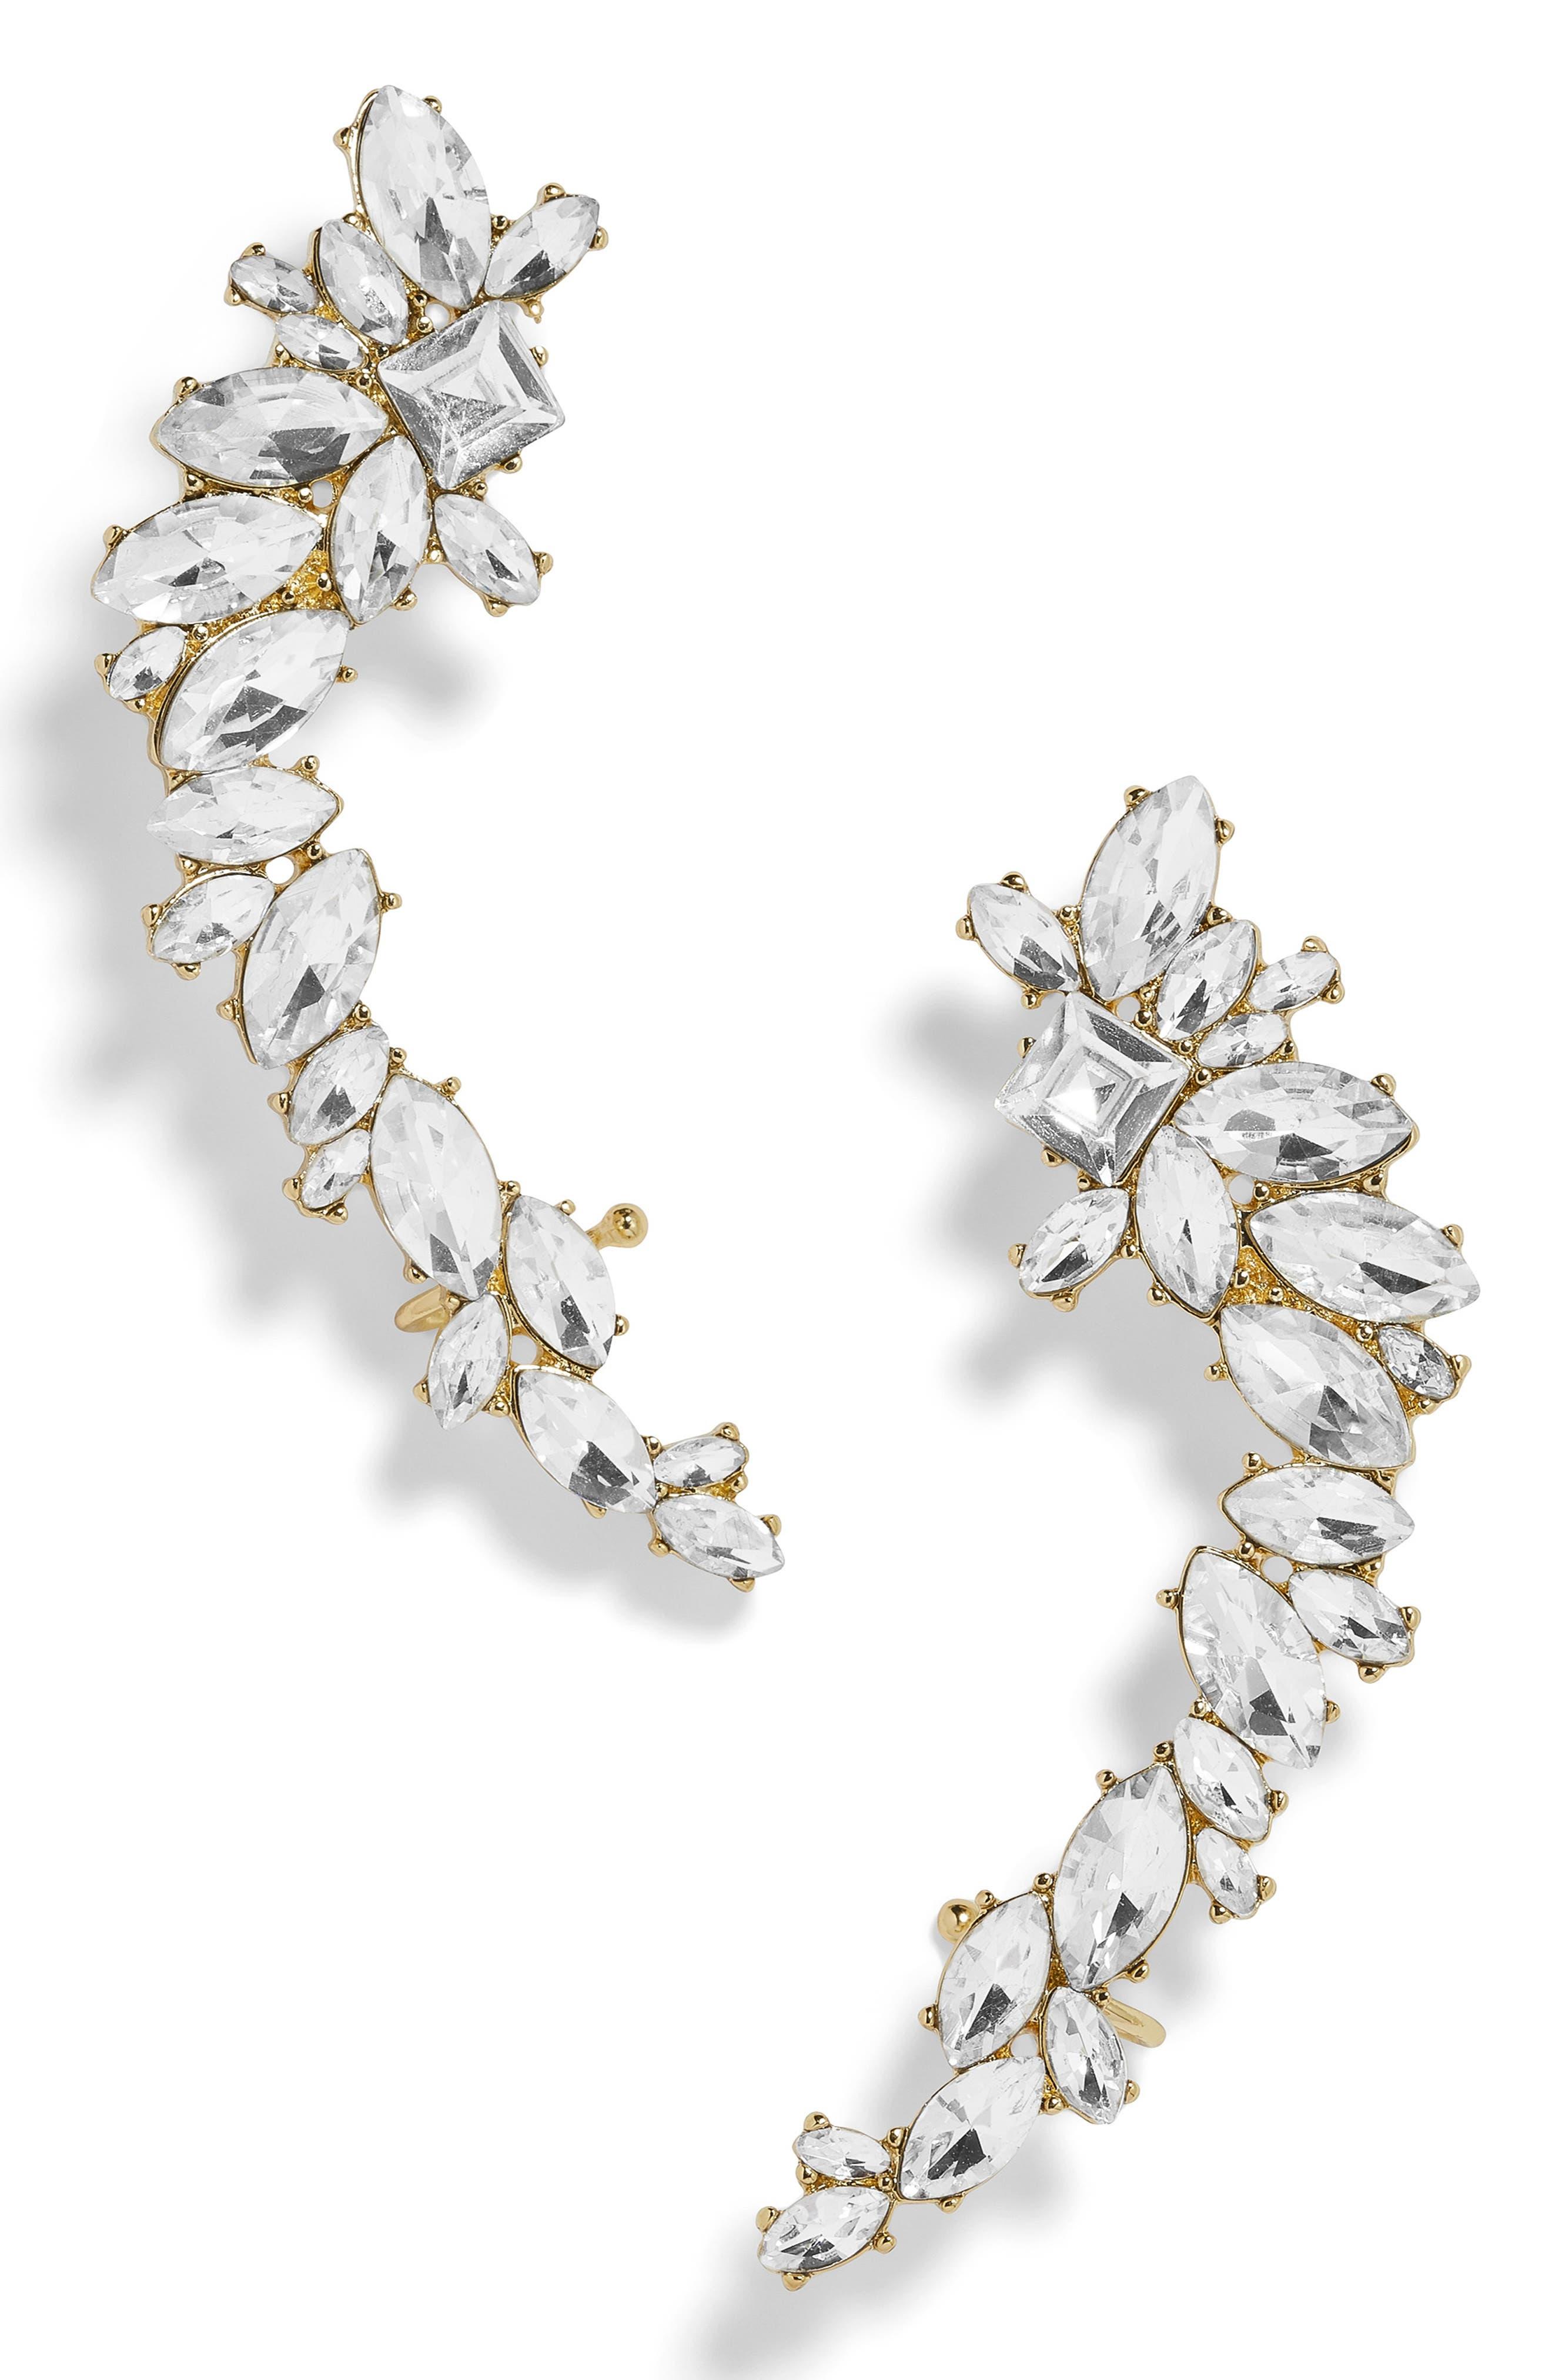 BAUBLEBAR Eliza Large Crystal Crawler Earrings, Main, color, GOLD